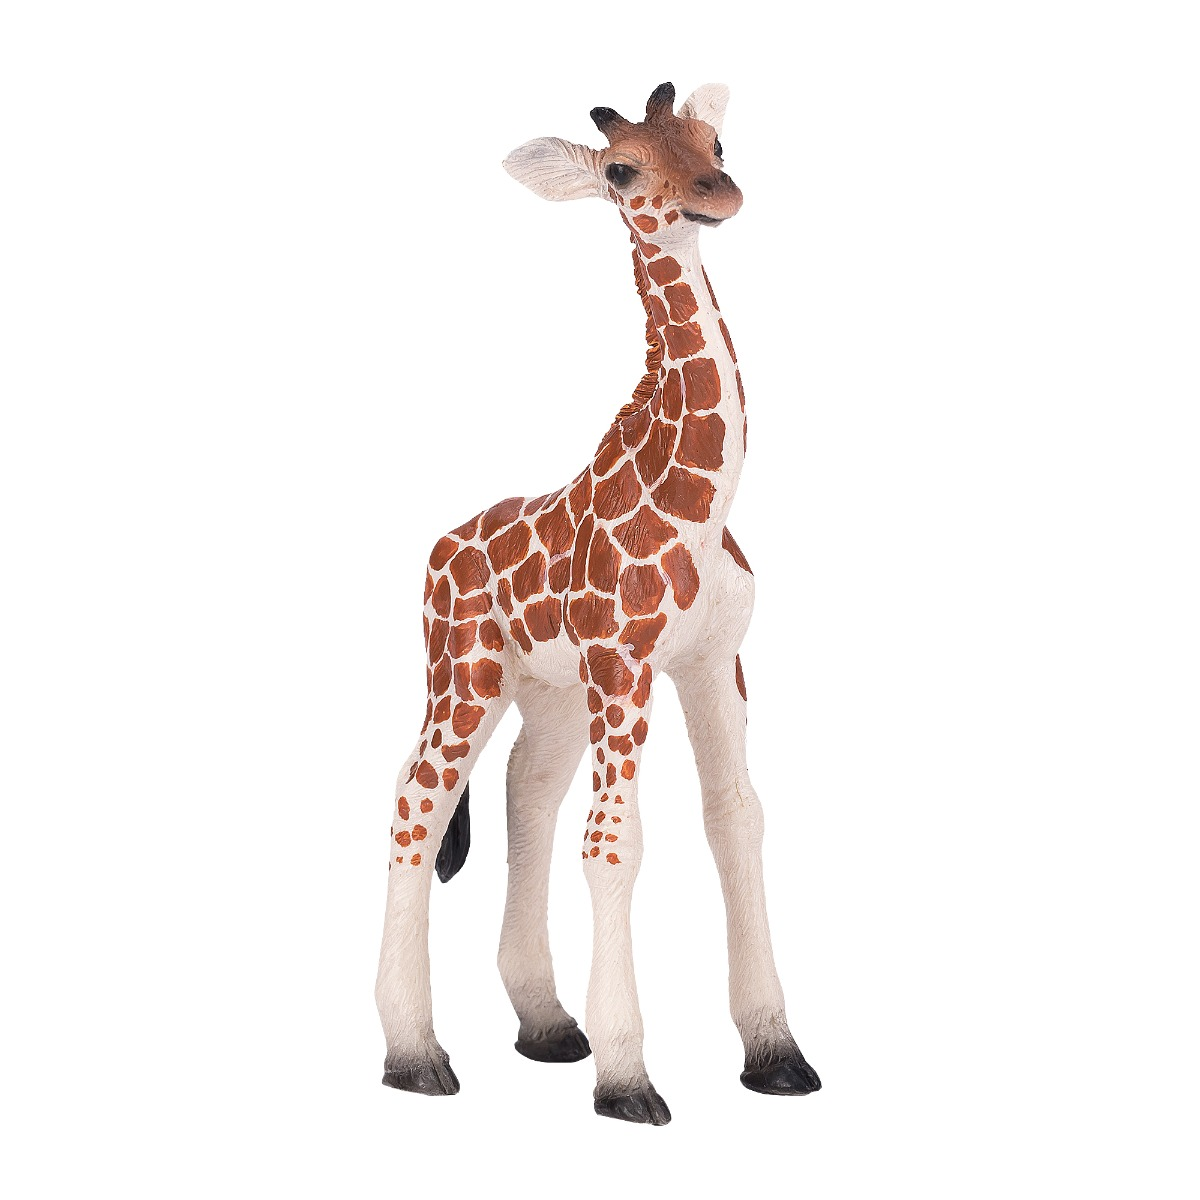 Figurina Mojo, Girafa Pui